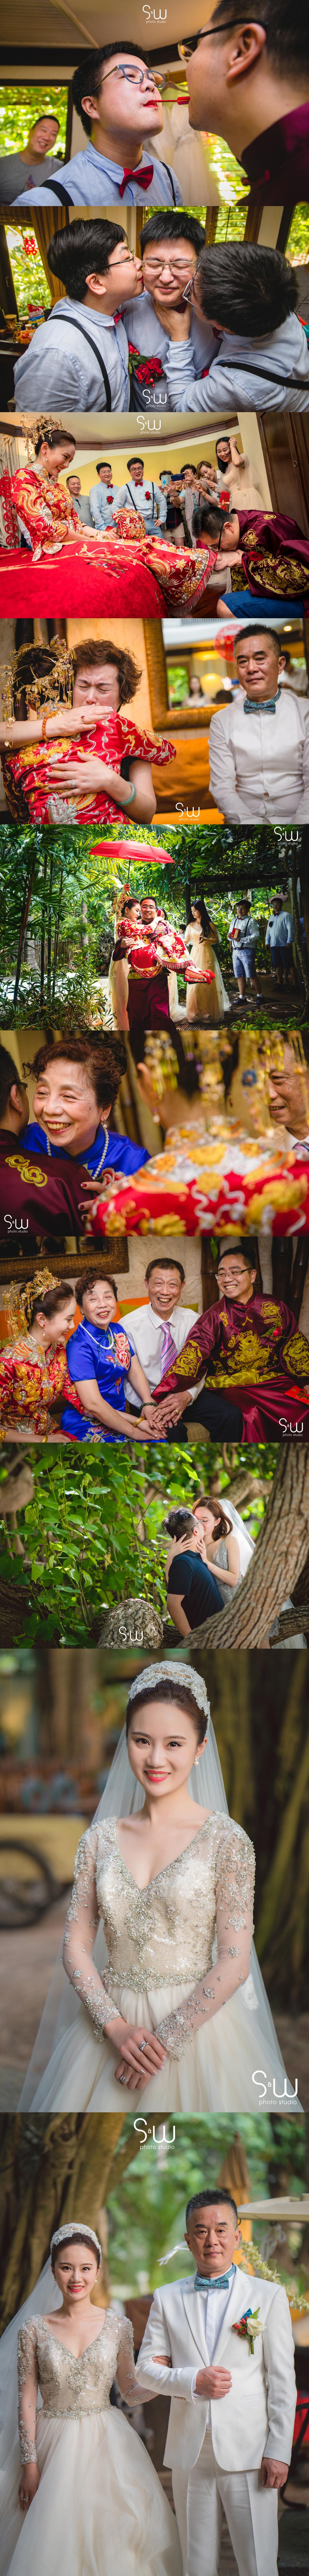 WEDDING | Rayavadee, Krabi, Thailand (泰國甲米婚禮) | sw photo studio 婚禮, 婚攝, 婚紗, 海外婚禮, 海外婚紗, 海島婚禮,峇里島婚禮, 峇里島婚紗, 台灣婚禮, 婚攝推薦